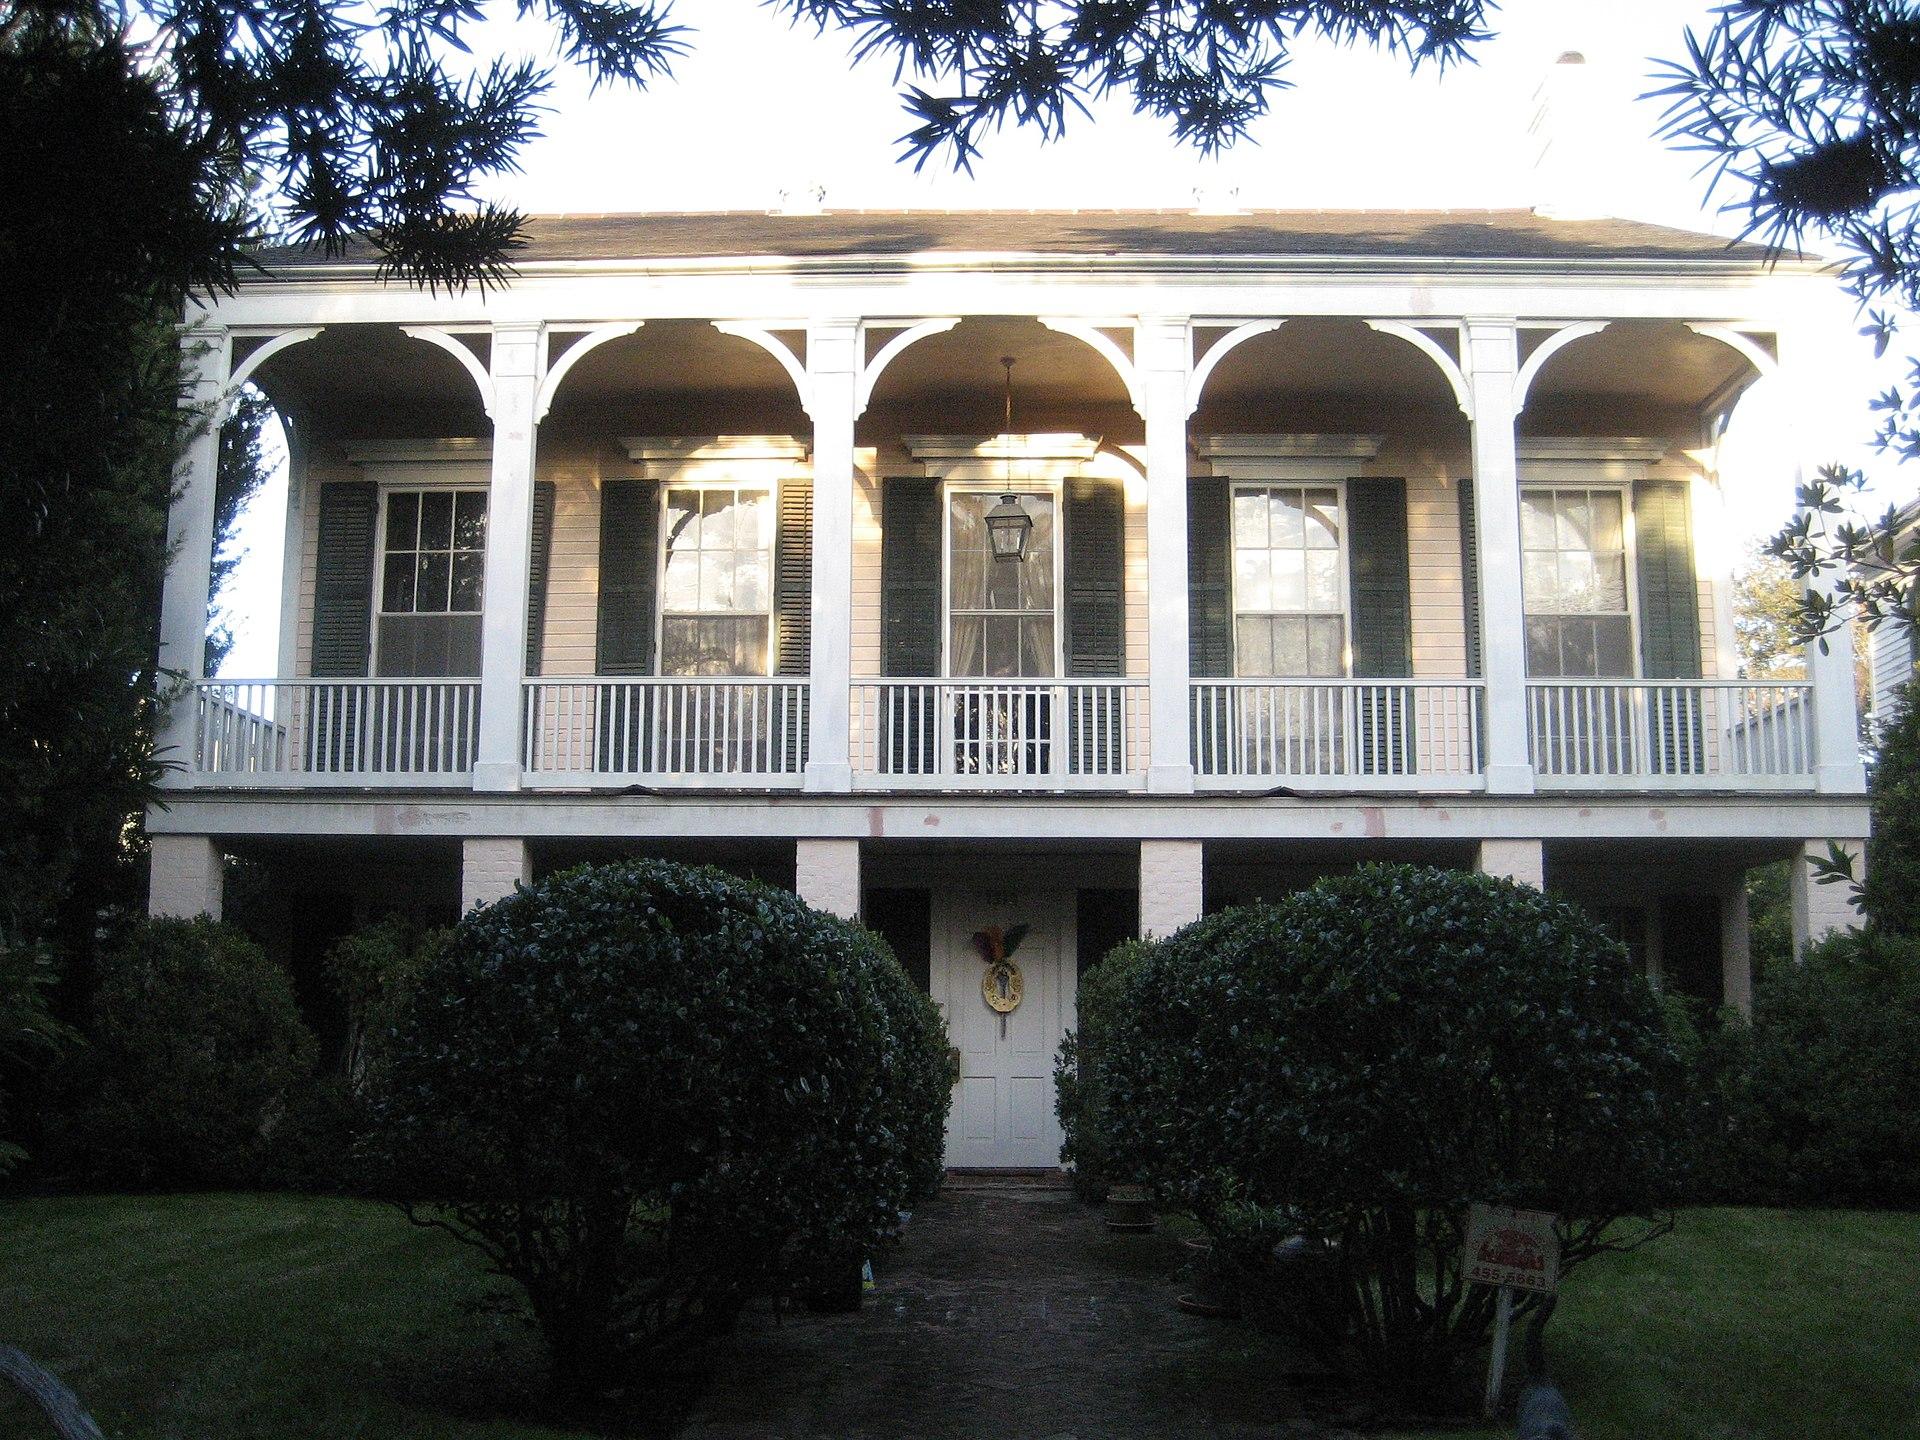 George washington cable house simple english wikipedia for Minimalist house wiki